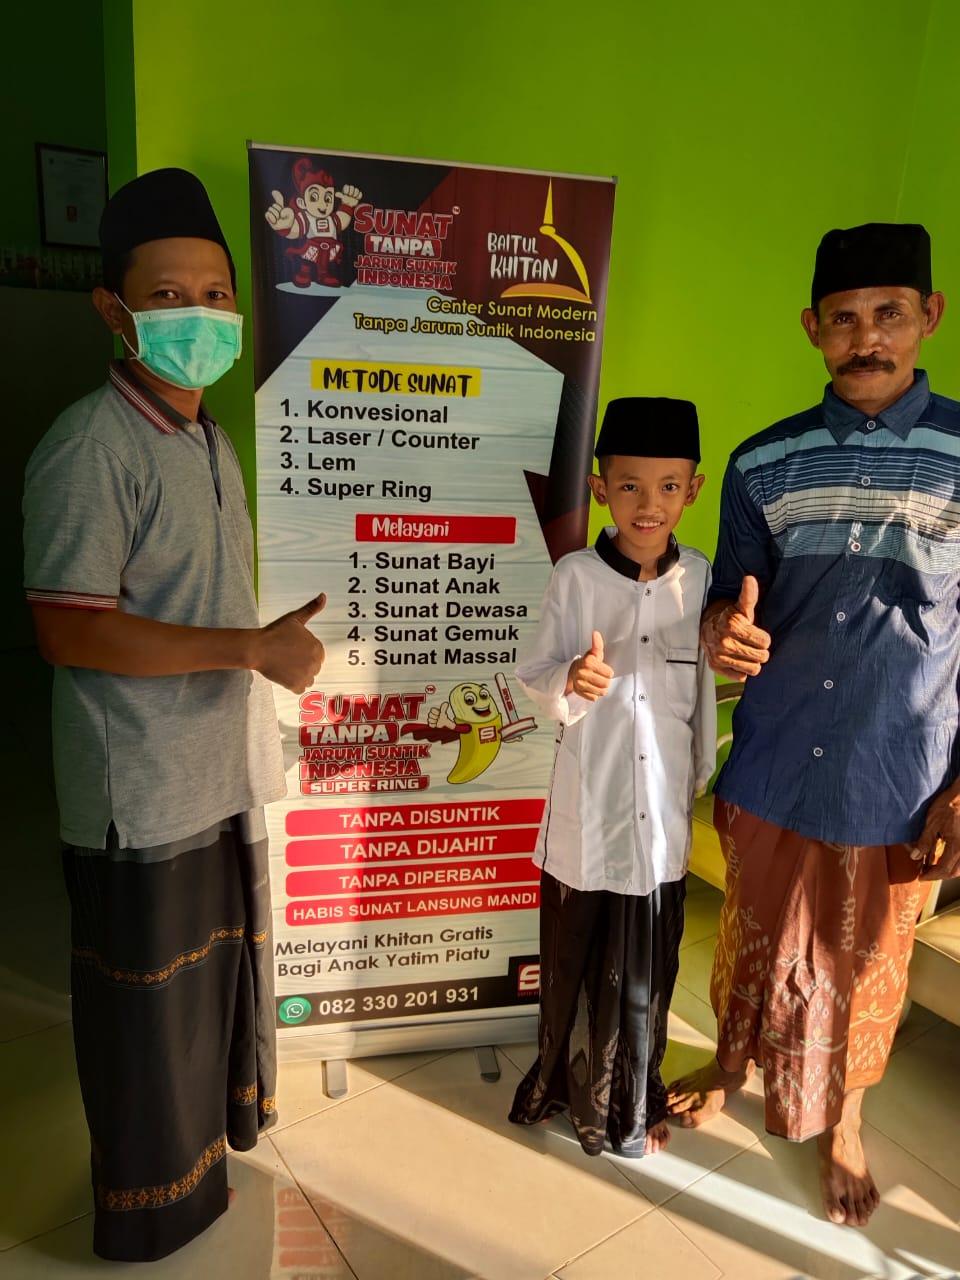 SUNAT MODERN PROBOLINGGO TANPA SUNTIK INDONESIA